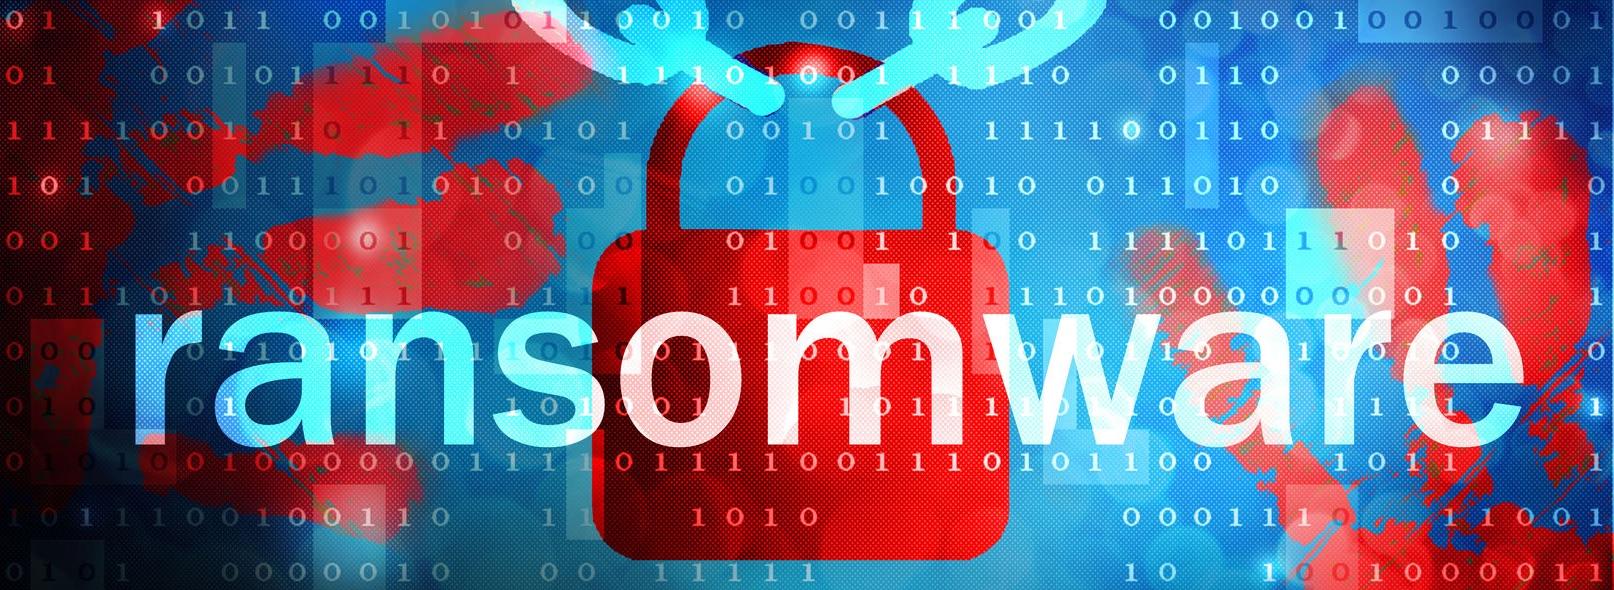 Ransomware_Crop